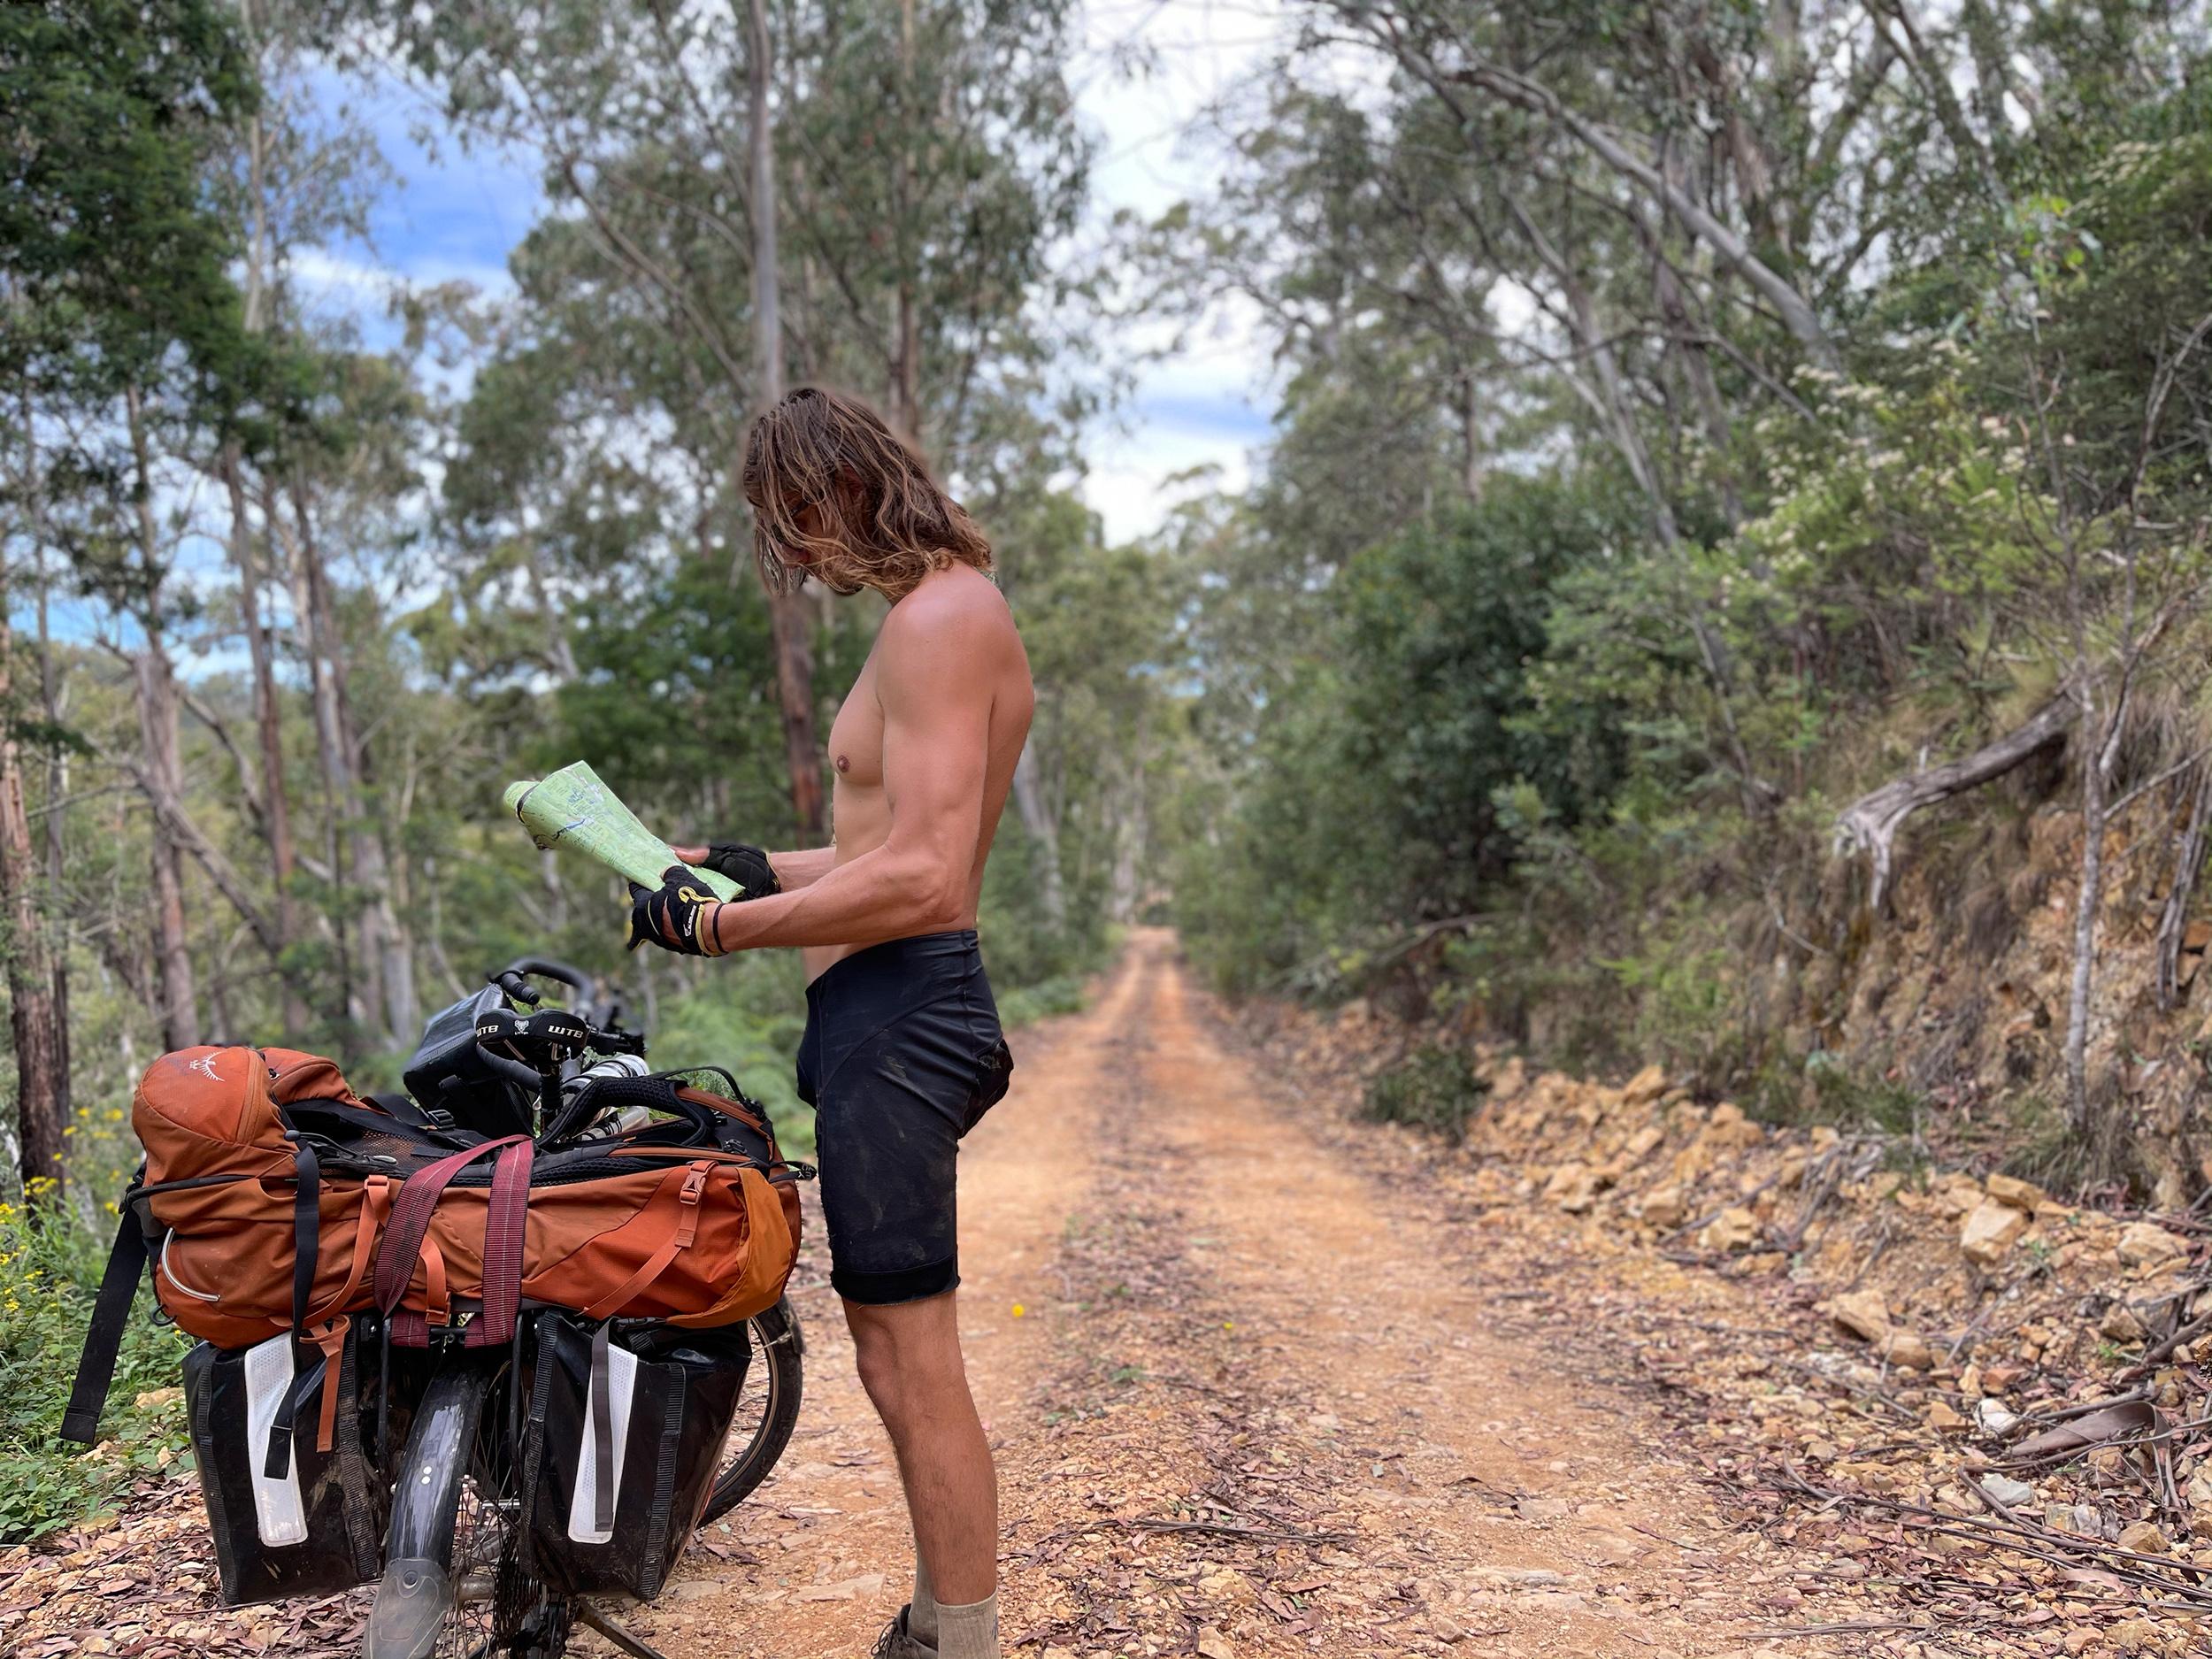 Keddy checks a map at a spot south of Mount Terrible (Layton Keddy)